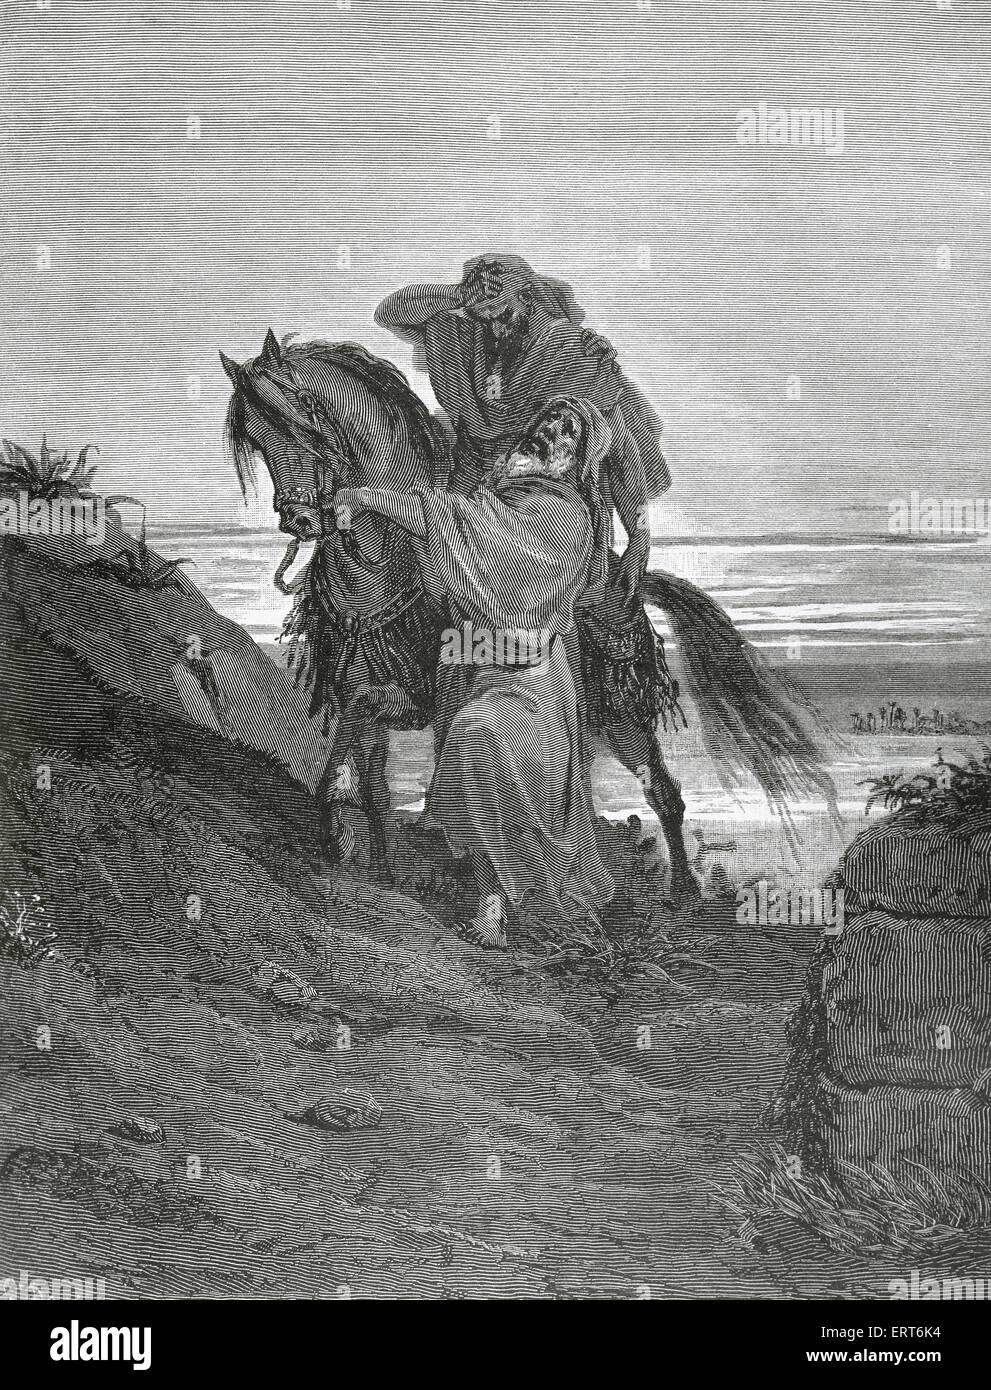 Parable of the Good Samaritan. Gospel of Luke. Engraving by Gustave Dore. 19th century. - Stock Image